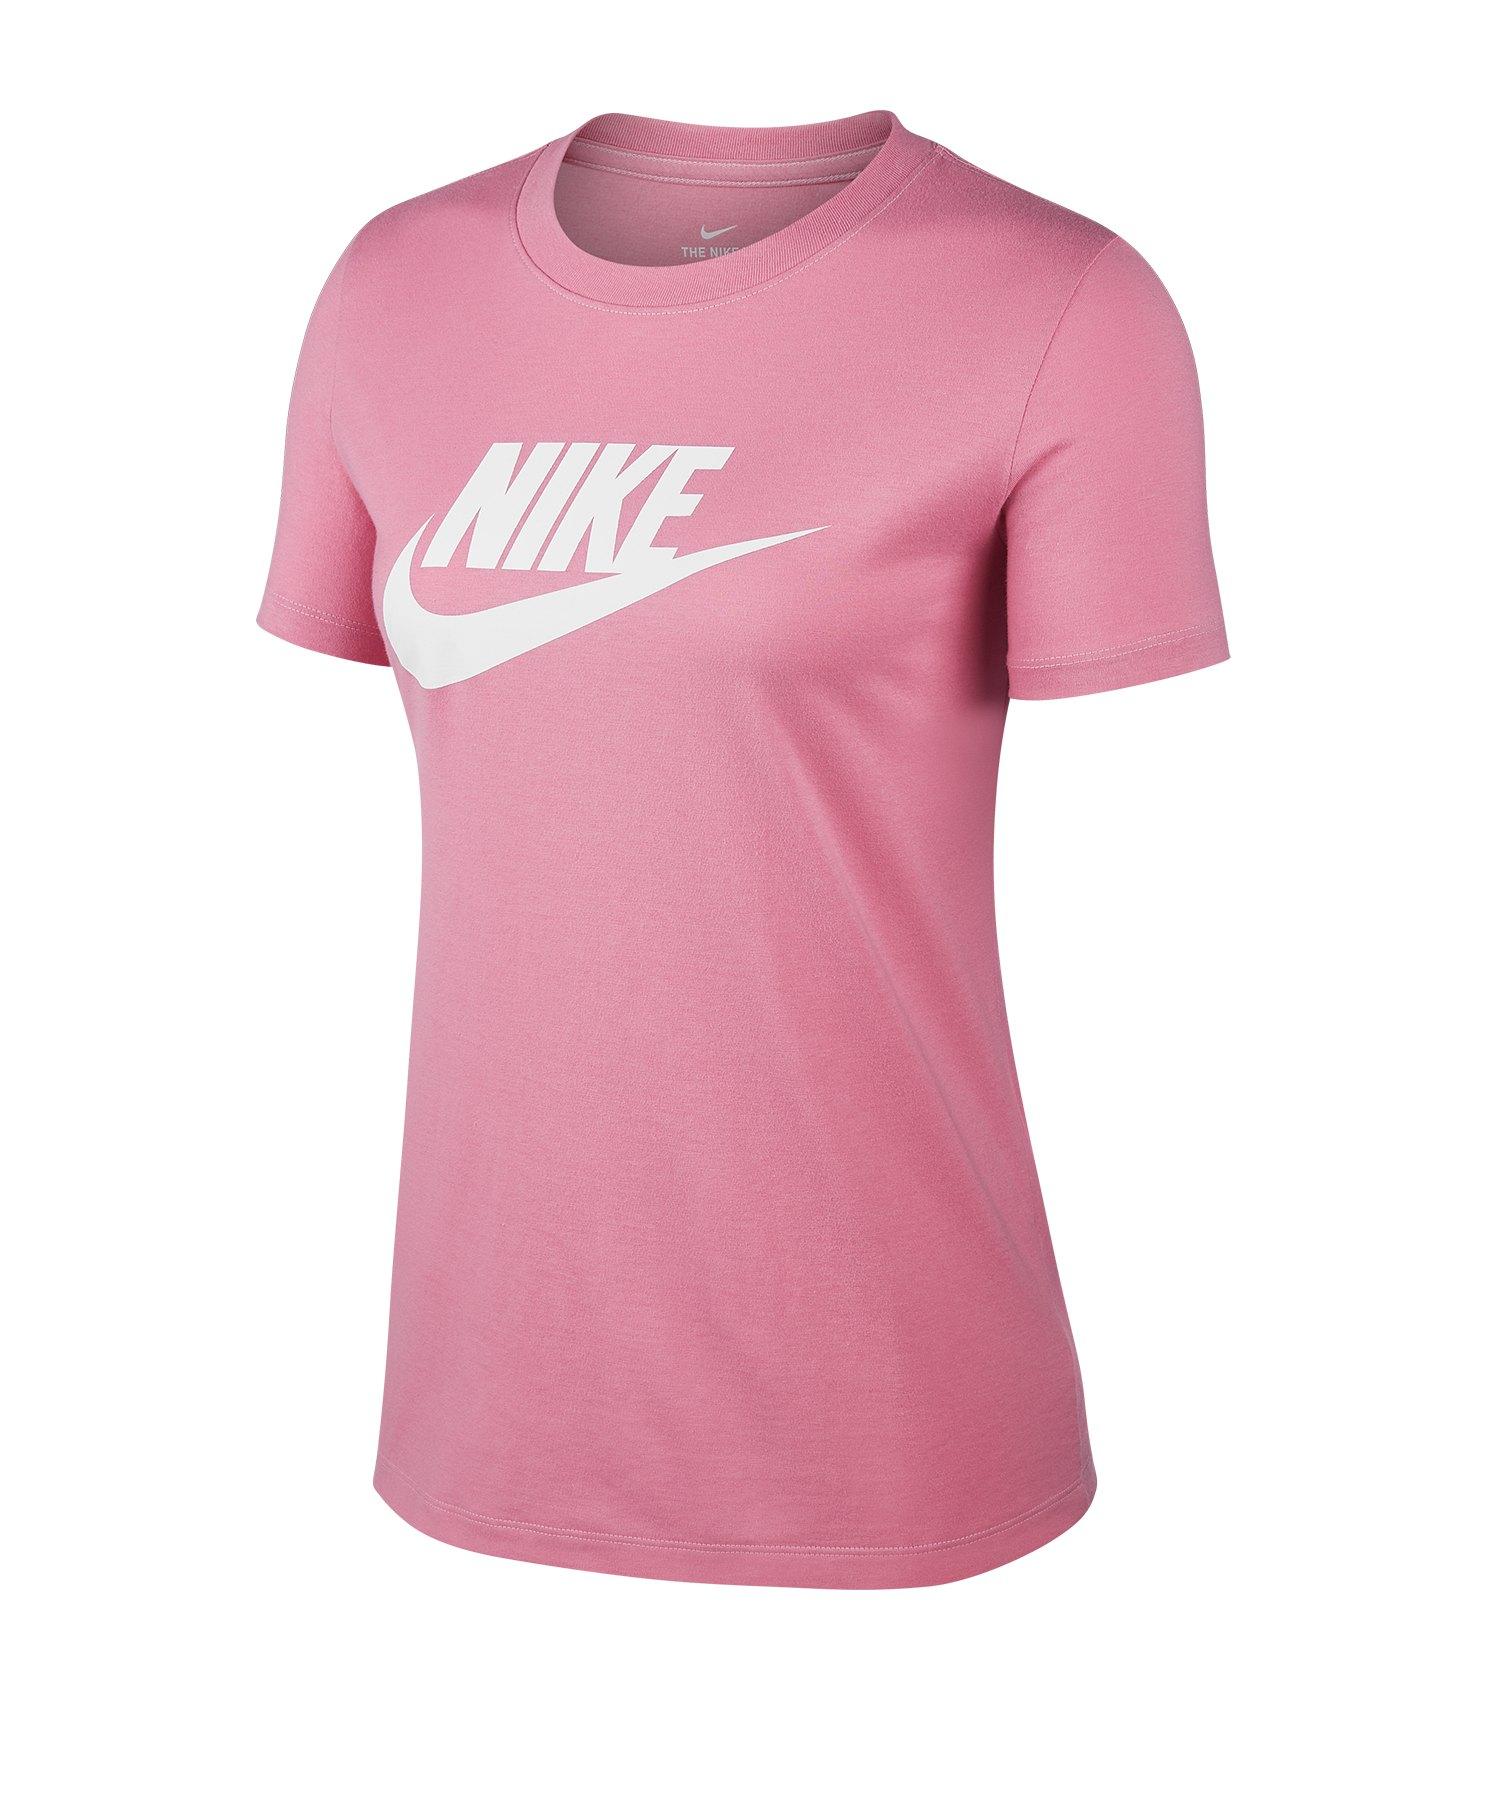 Nike Essential Tee T-Shirt Damen Rot F693 - rot